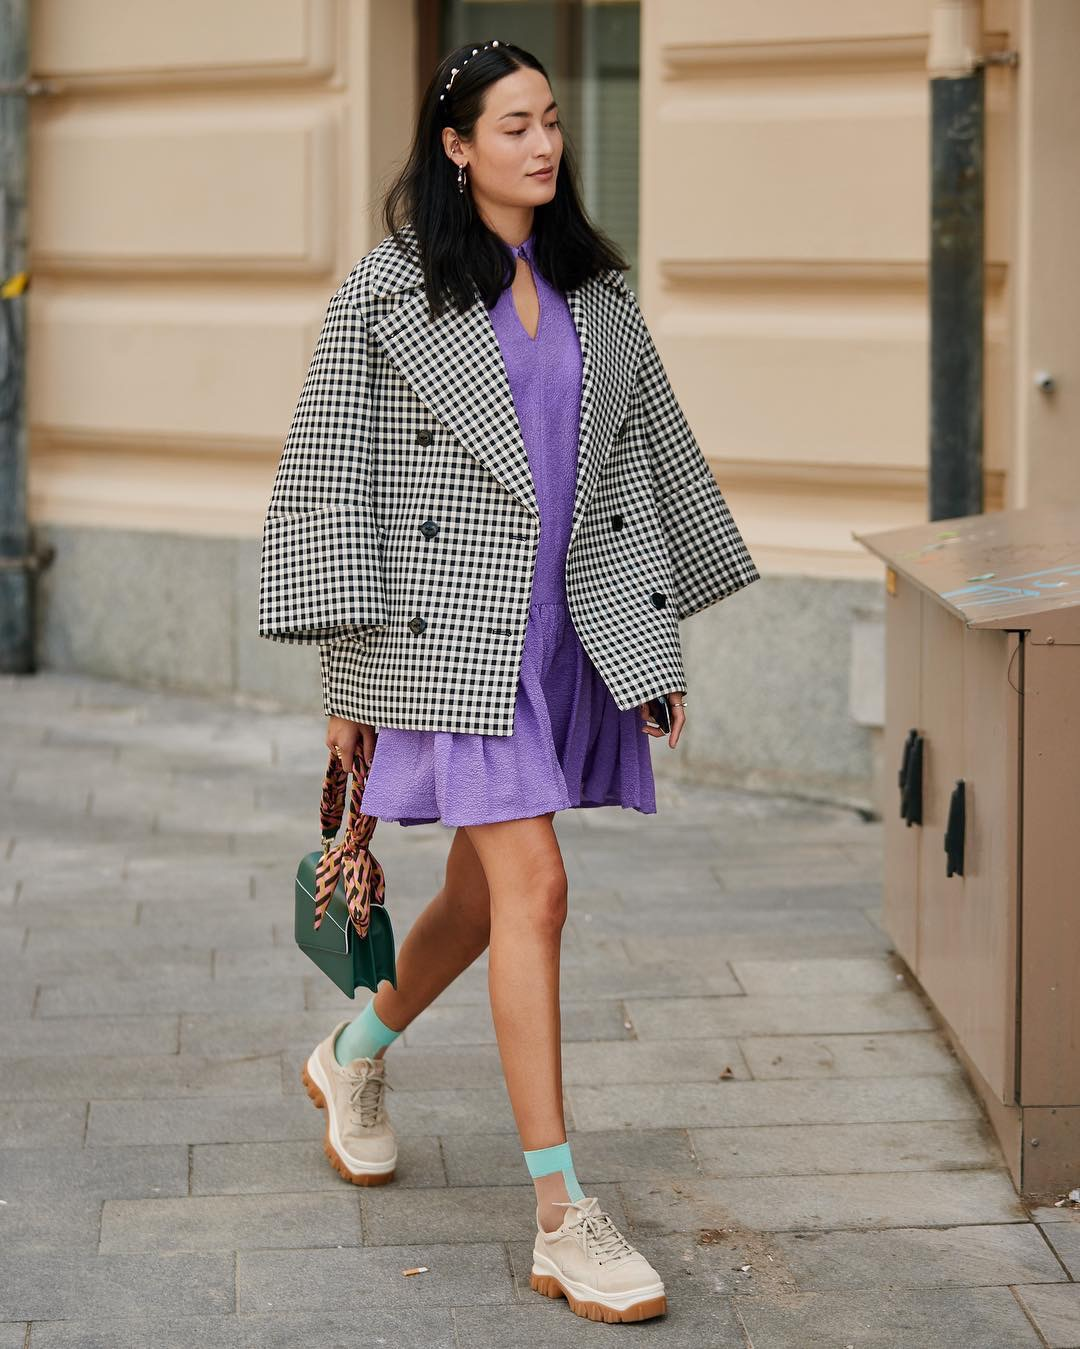 elle việt nam trang phục tím lavender 30